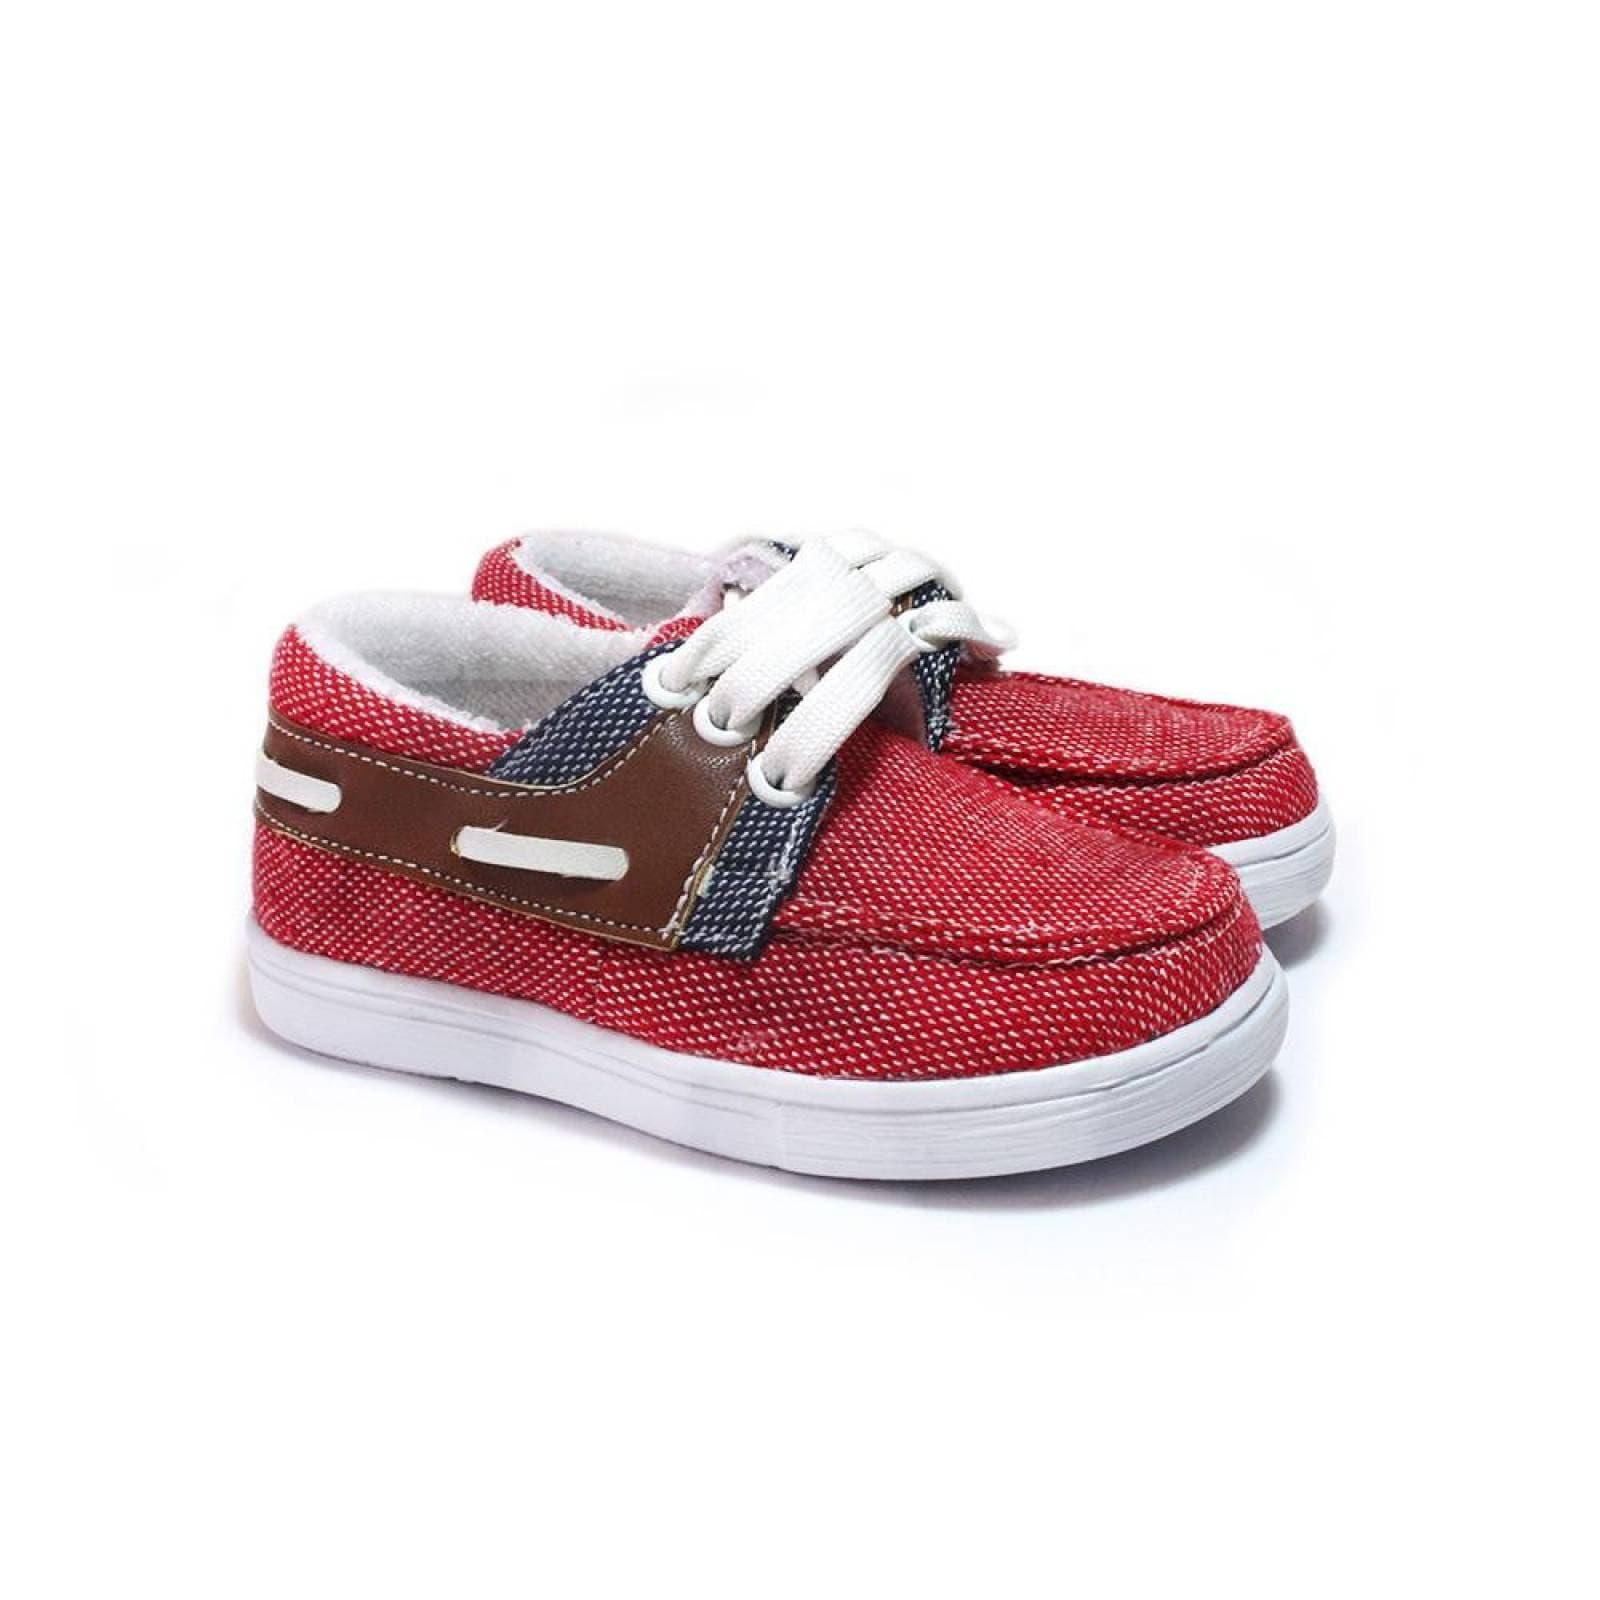 Tenis Zapato Casual Mini Fausto Artesanal Infantil Rojo Komoni Talla: 12